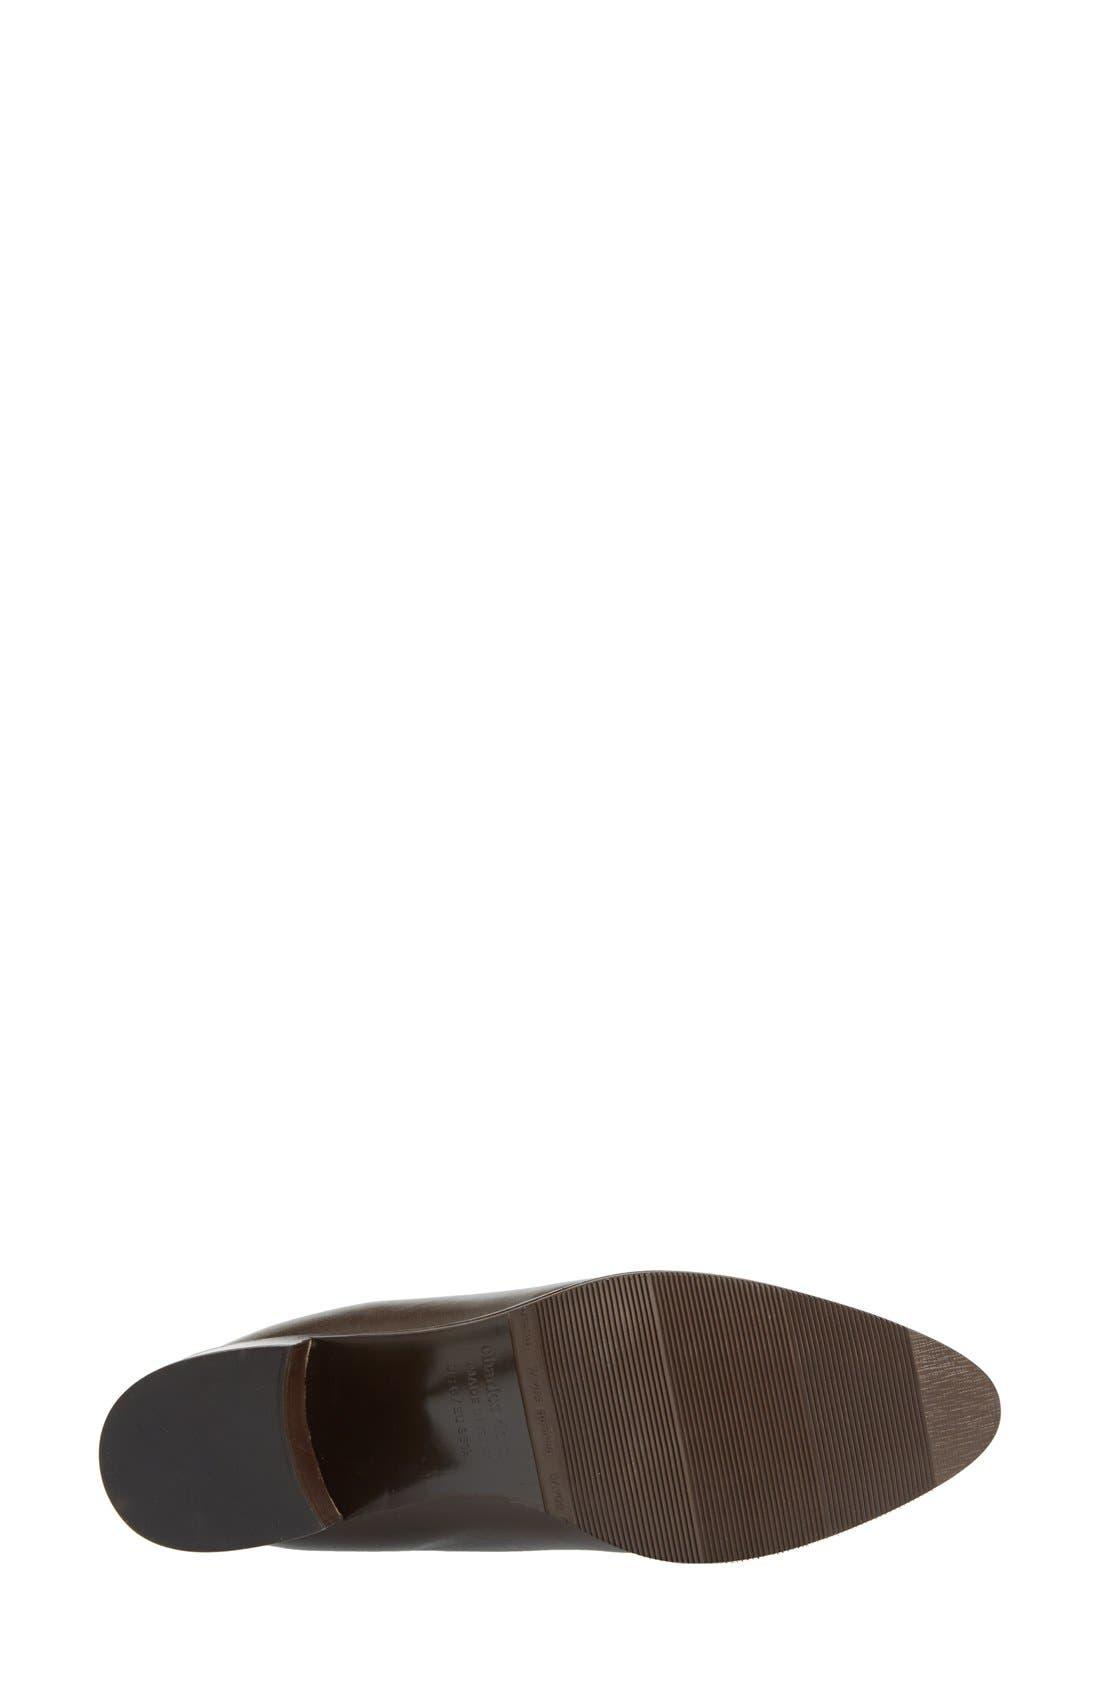 Alternate Image 4  - Charles David 'Ramu' Leather Riding Boot (Women)